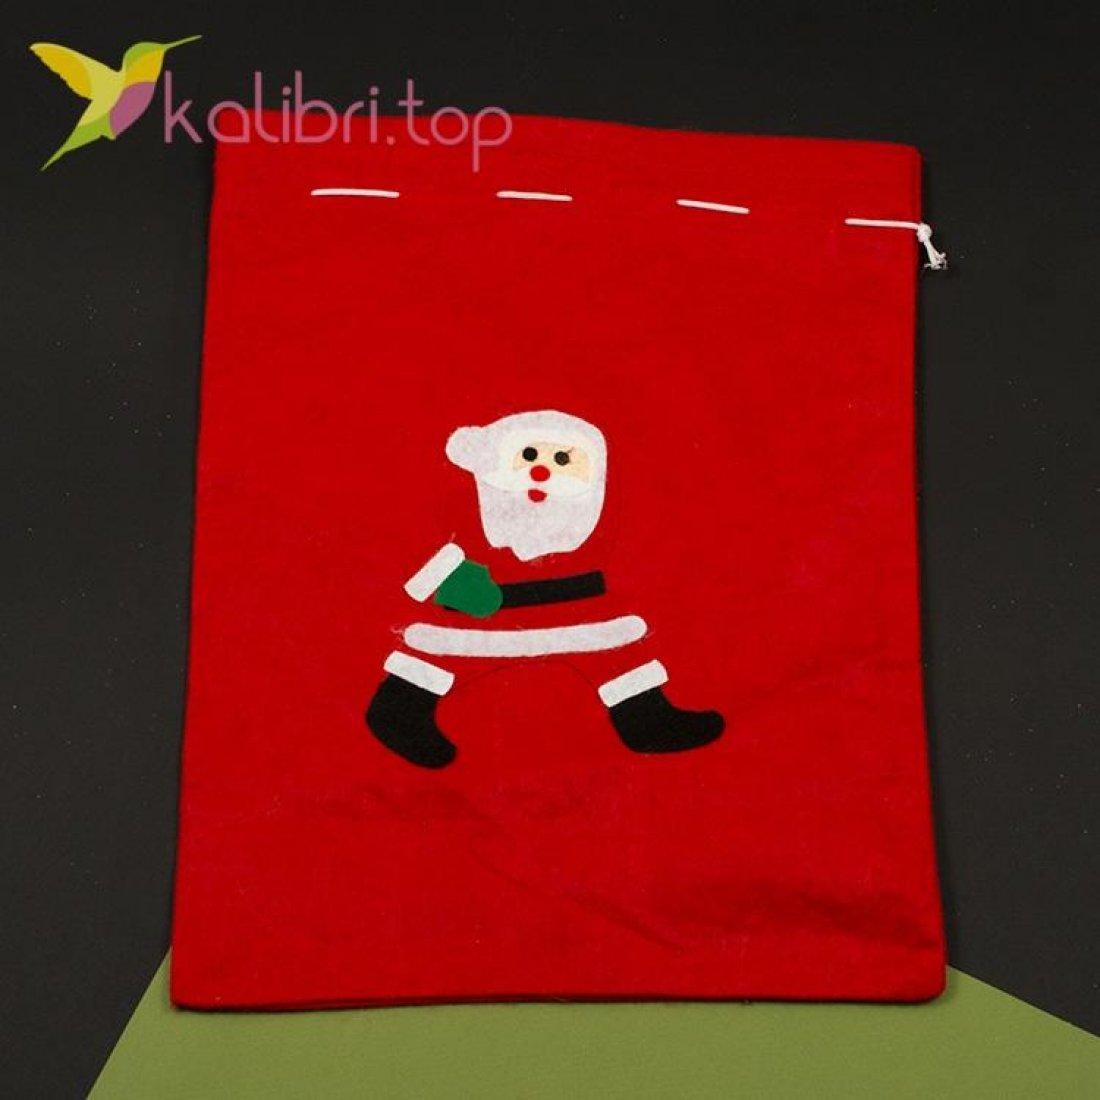 Мешок для подарков средний микс, оптом фото 5